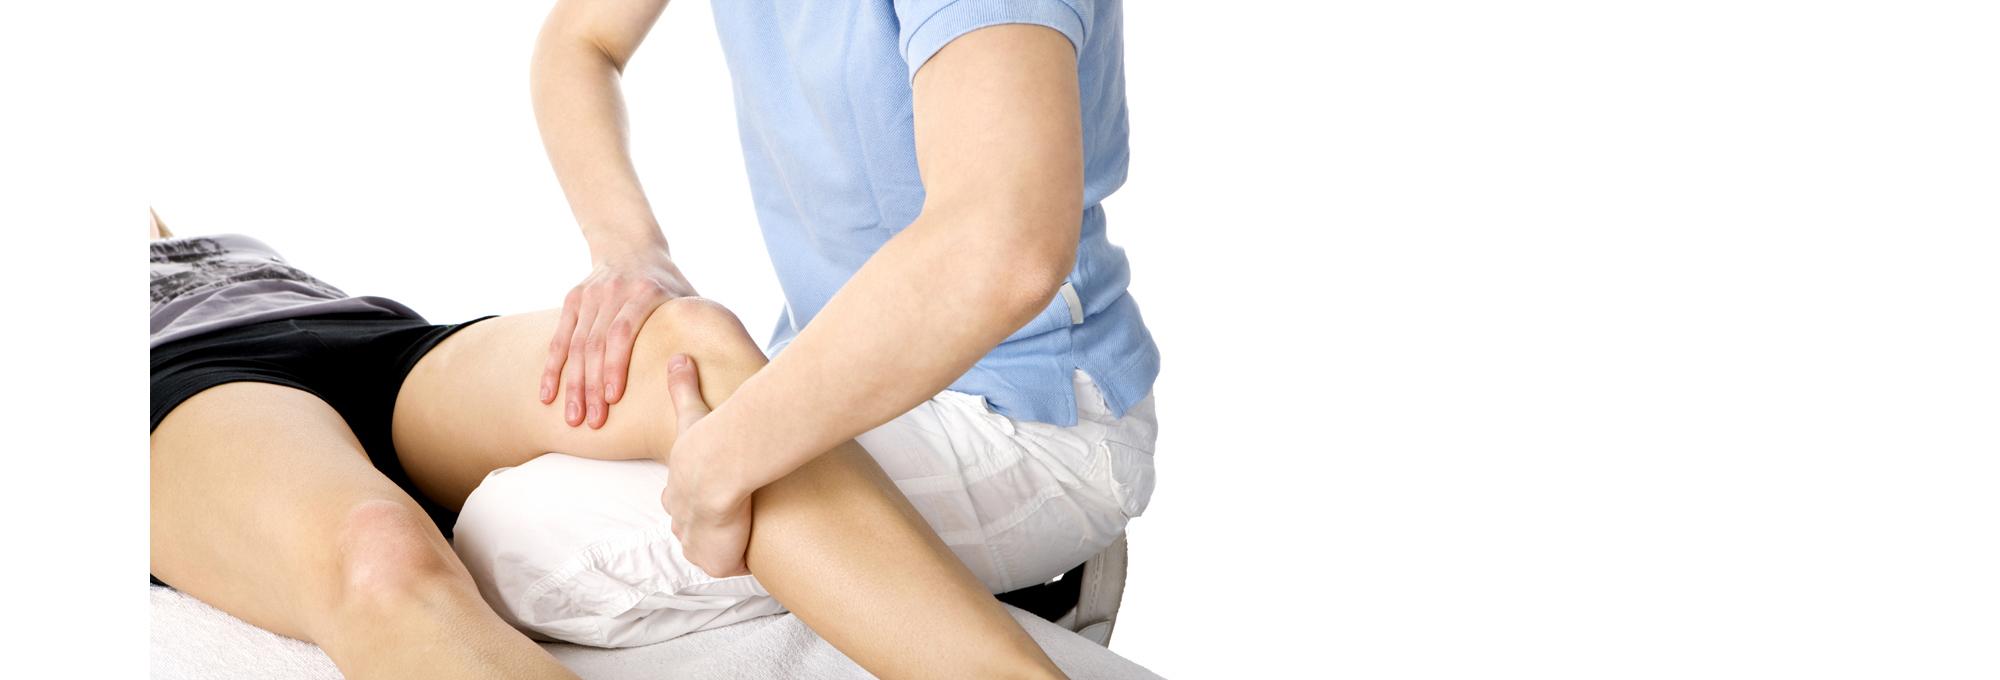 Clínica Asan Fisioterapia